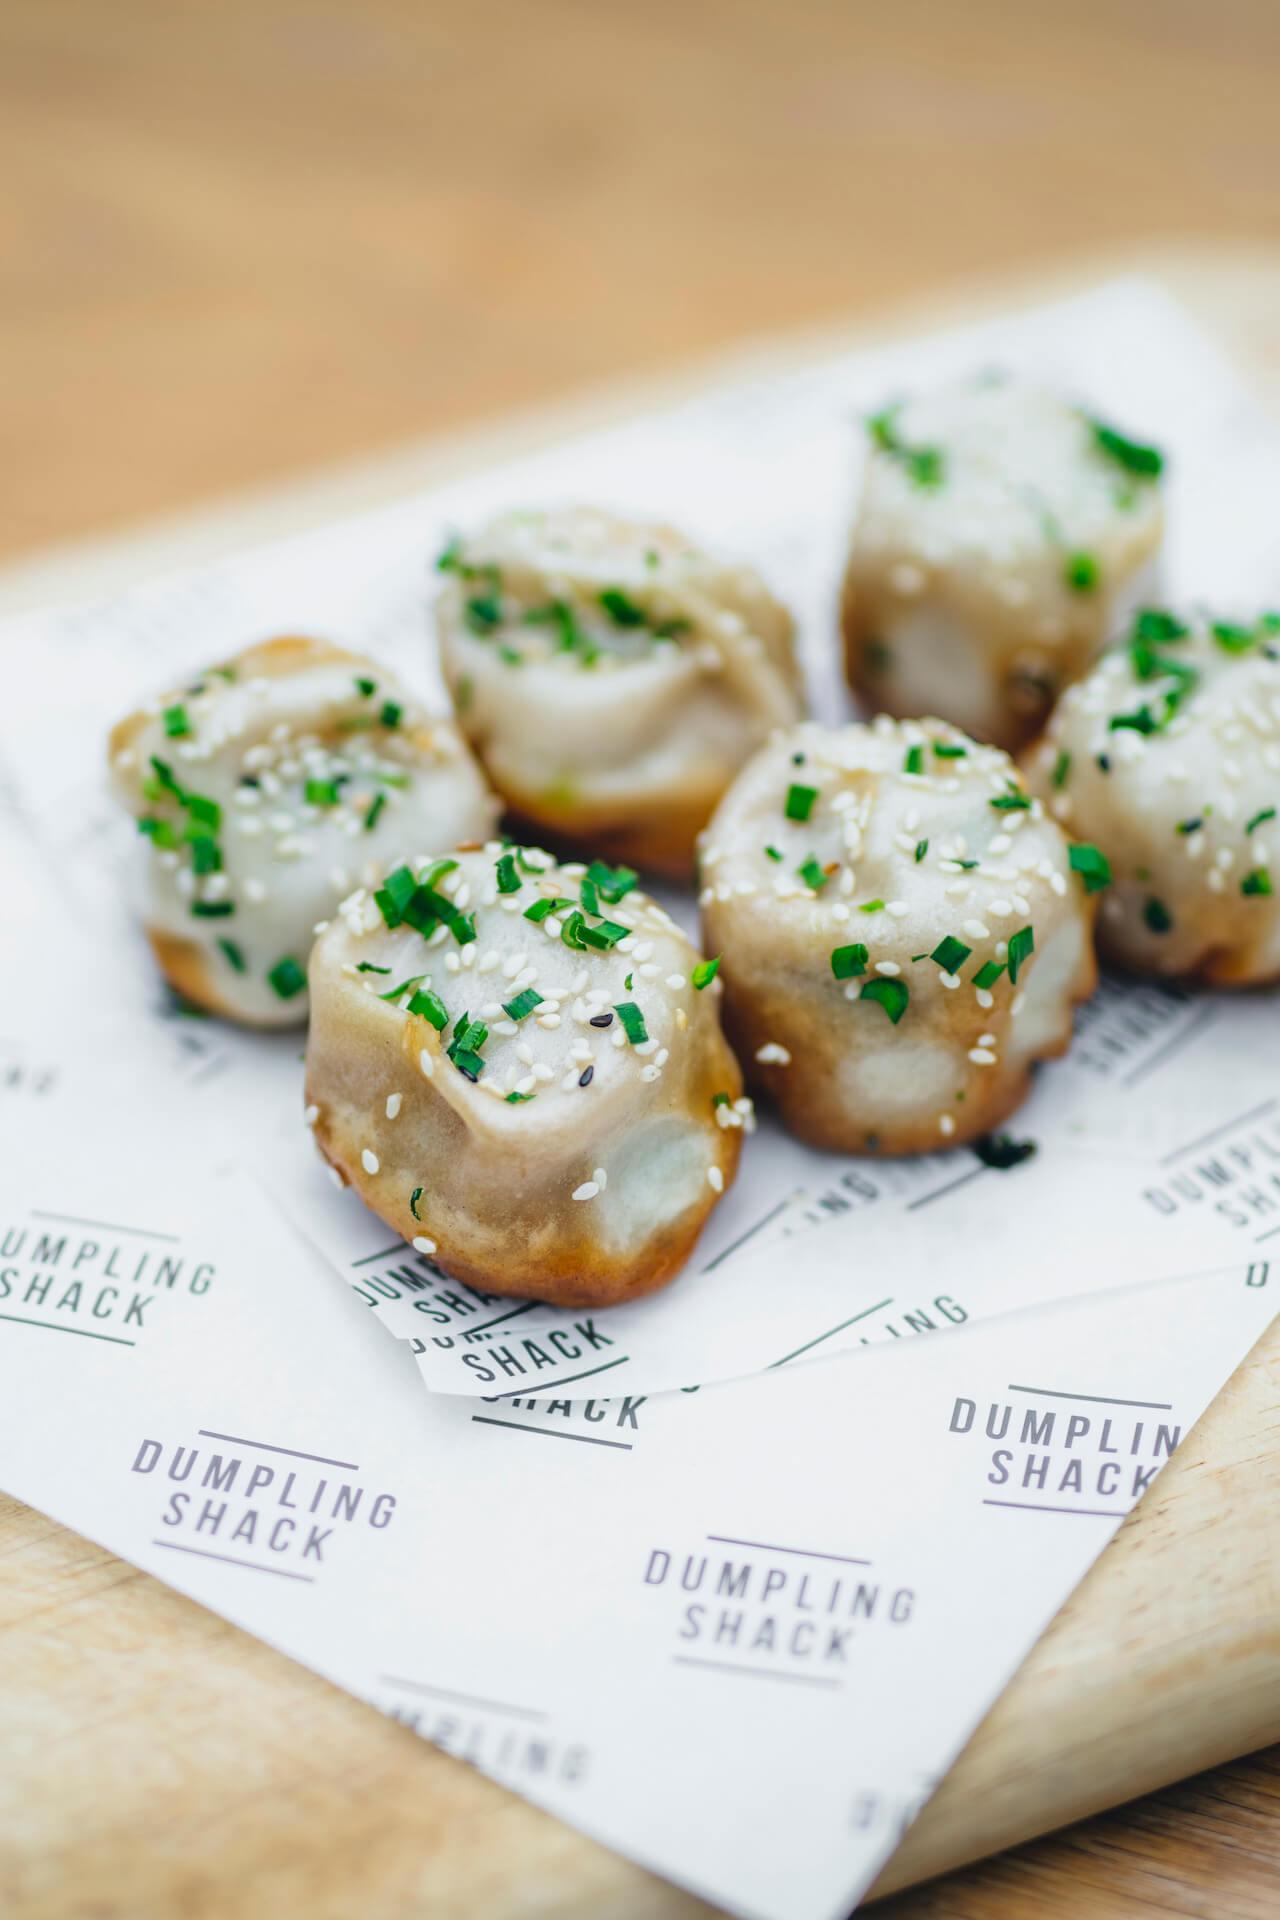 shengjianbao-leek-pork-fried-soup-dumpling-shack-london-2.jpg